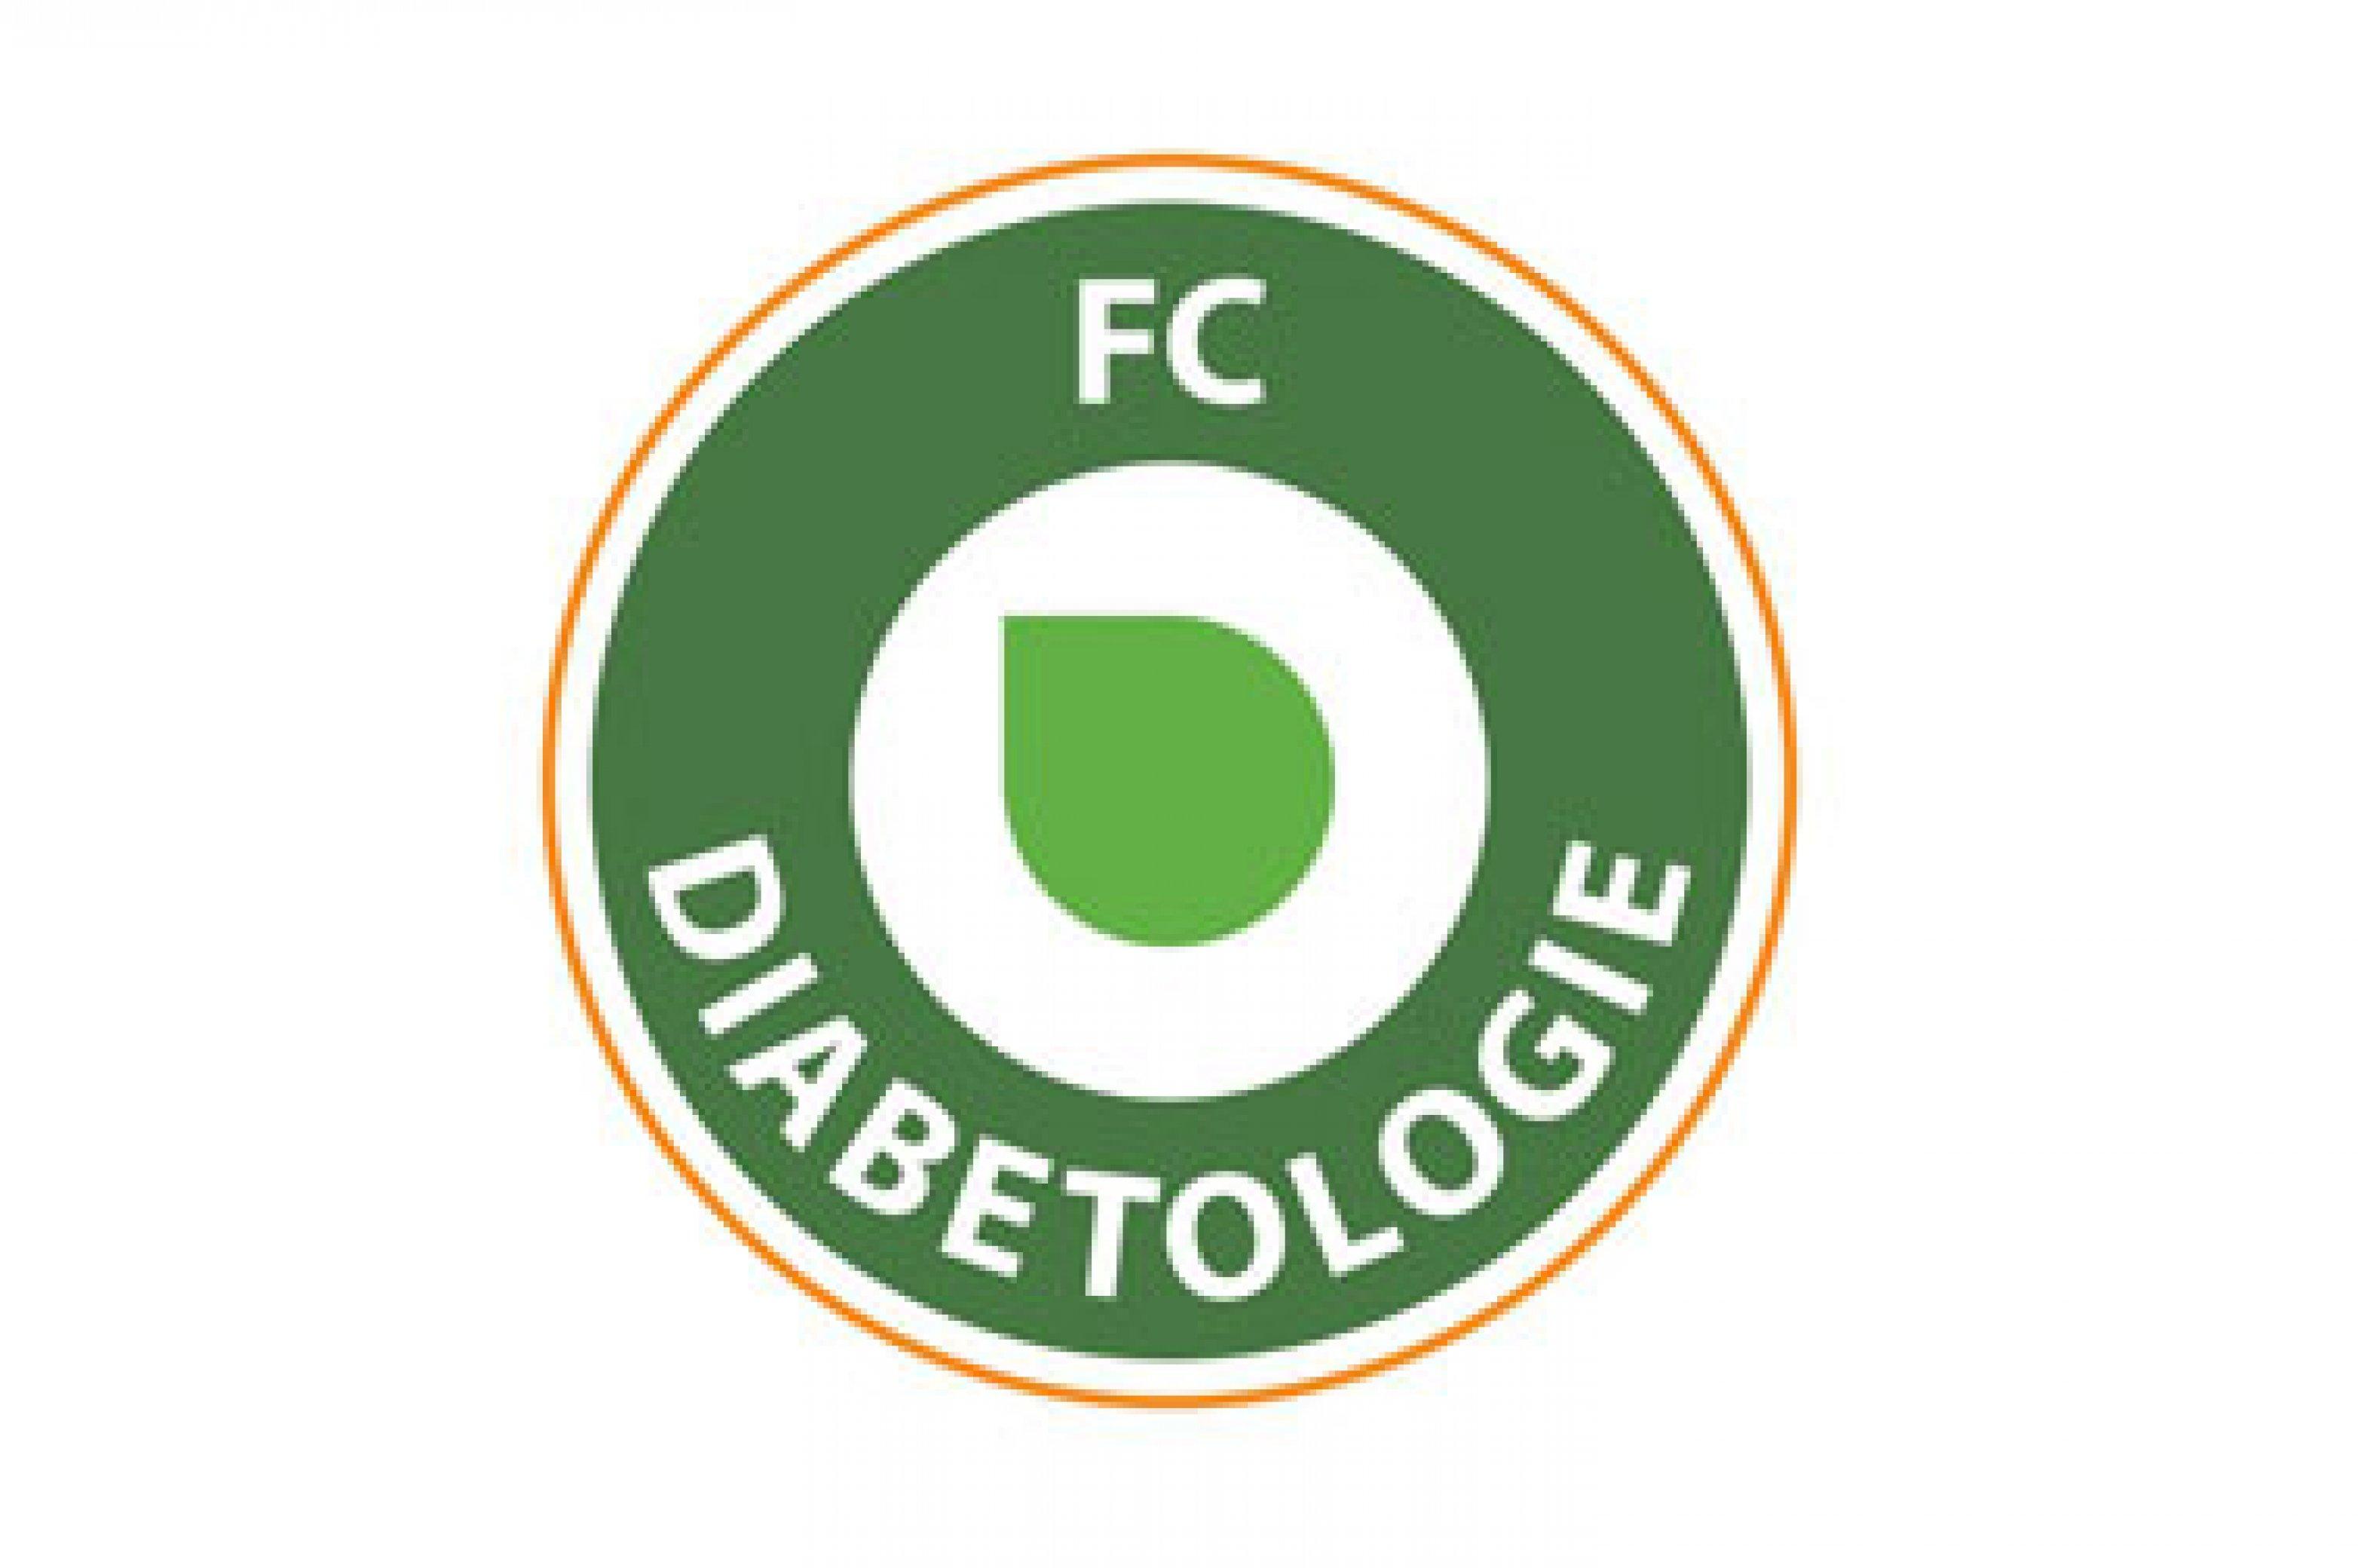 Logo FC Diabetologie